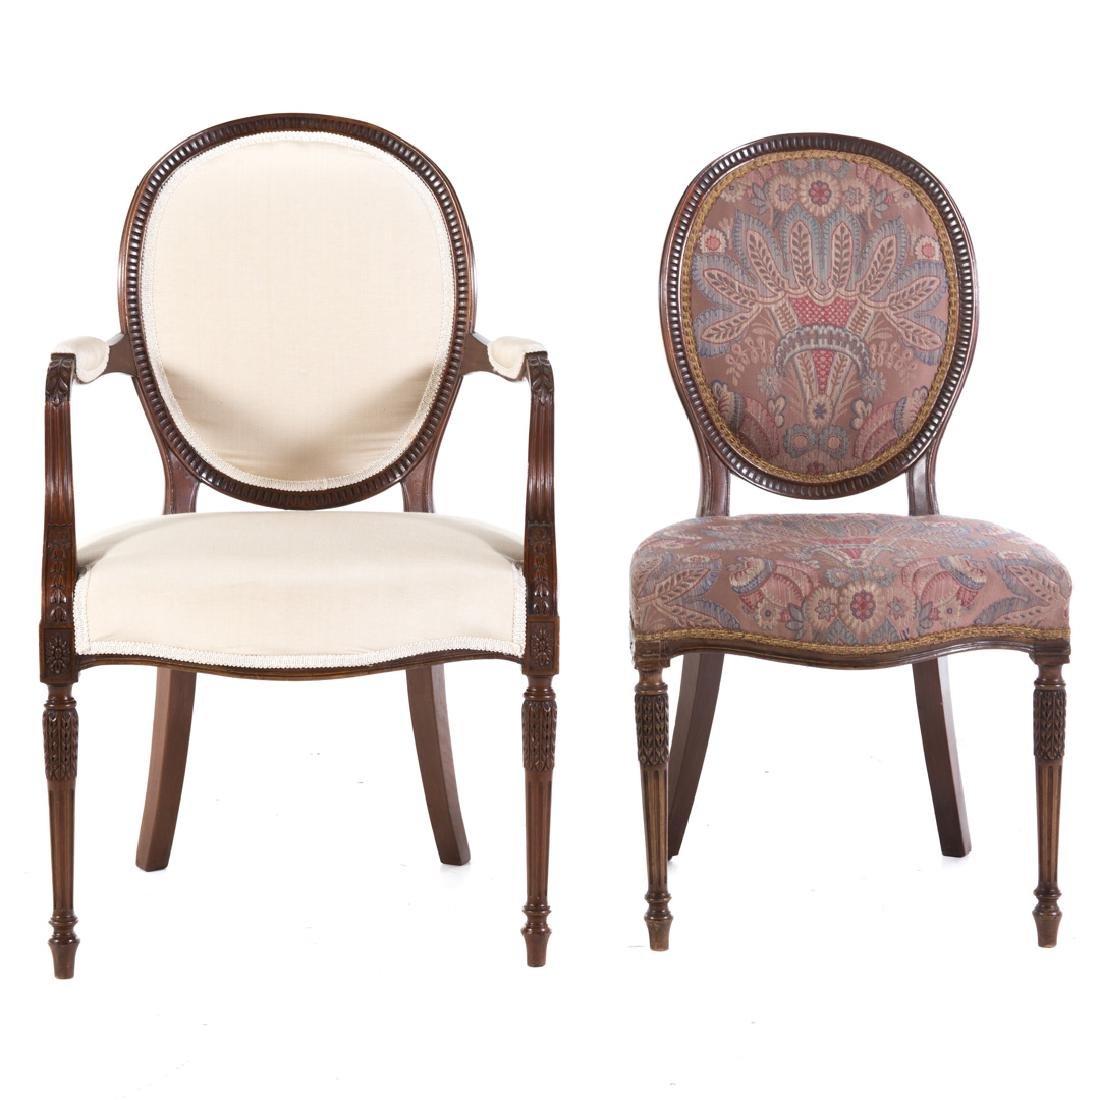 Eight George III style mahogany dining chairs - 4